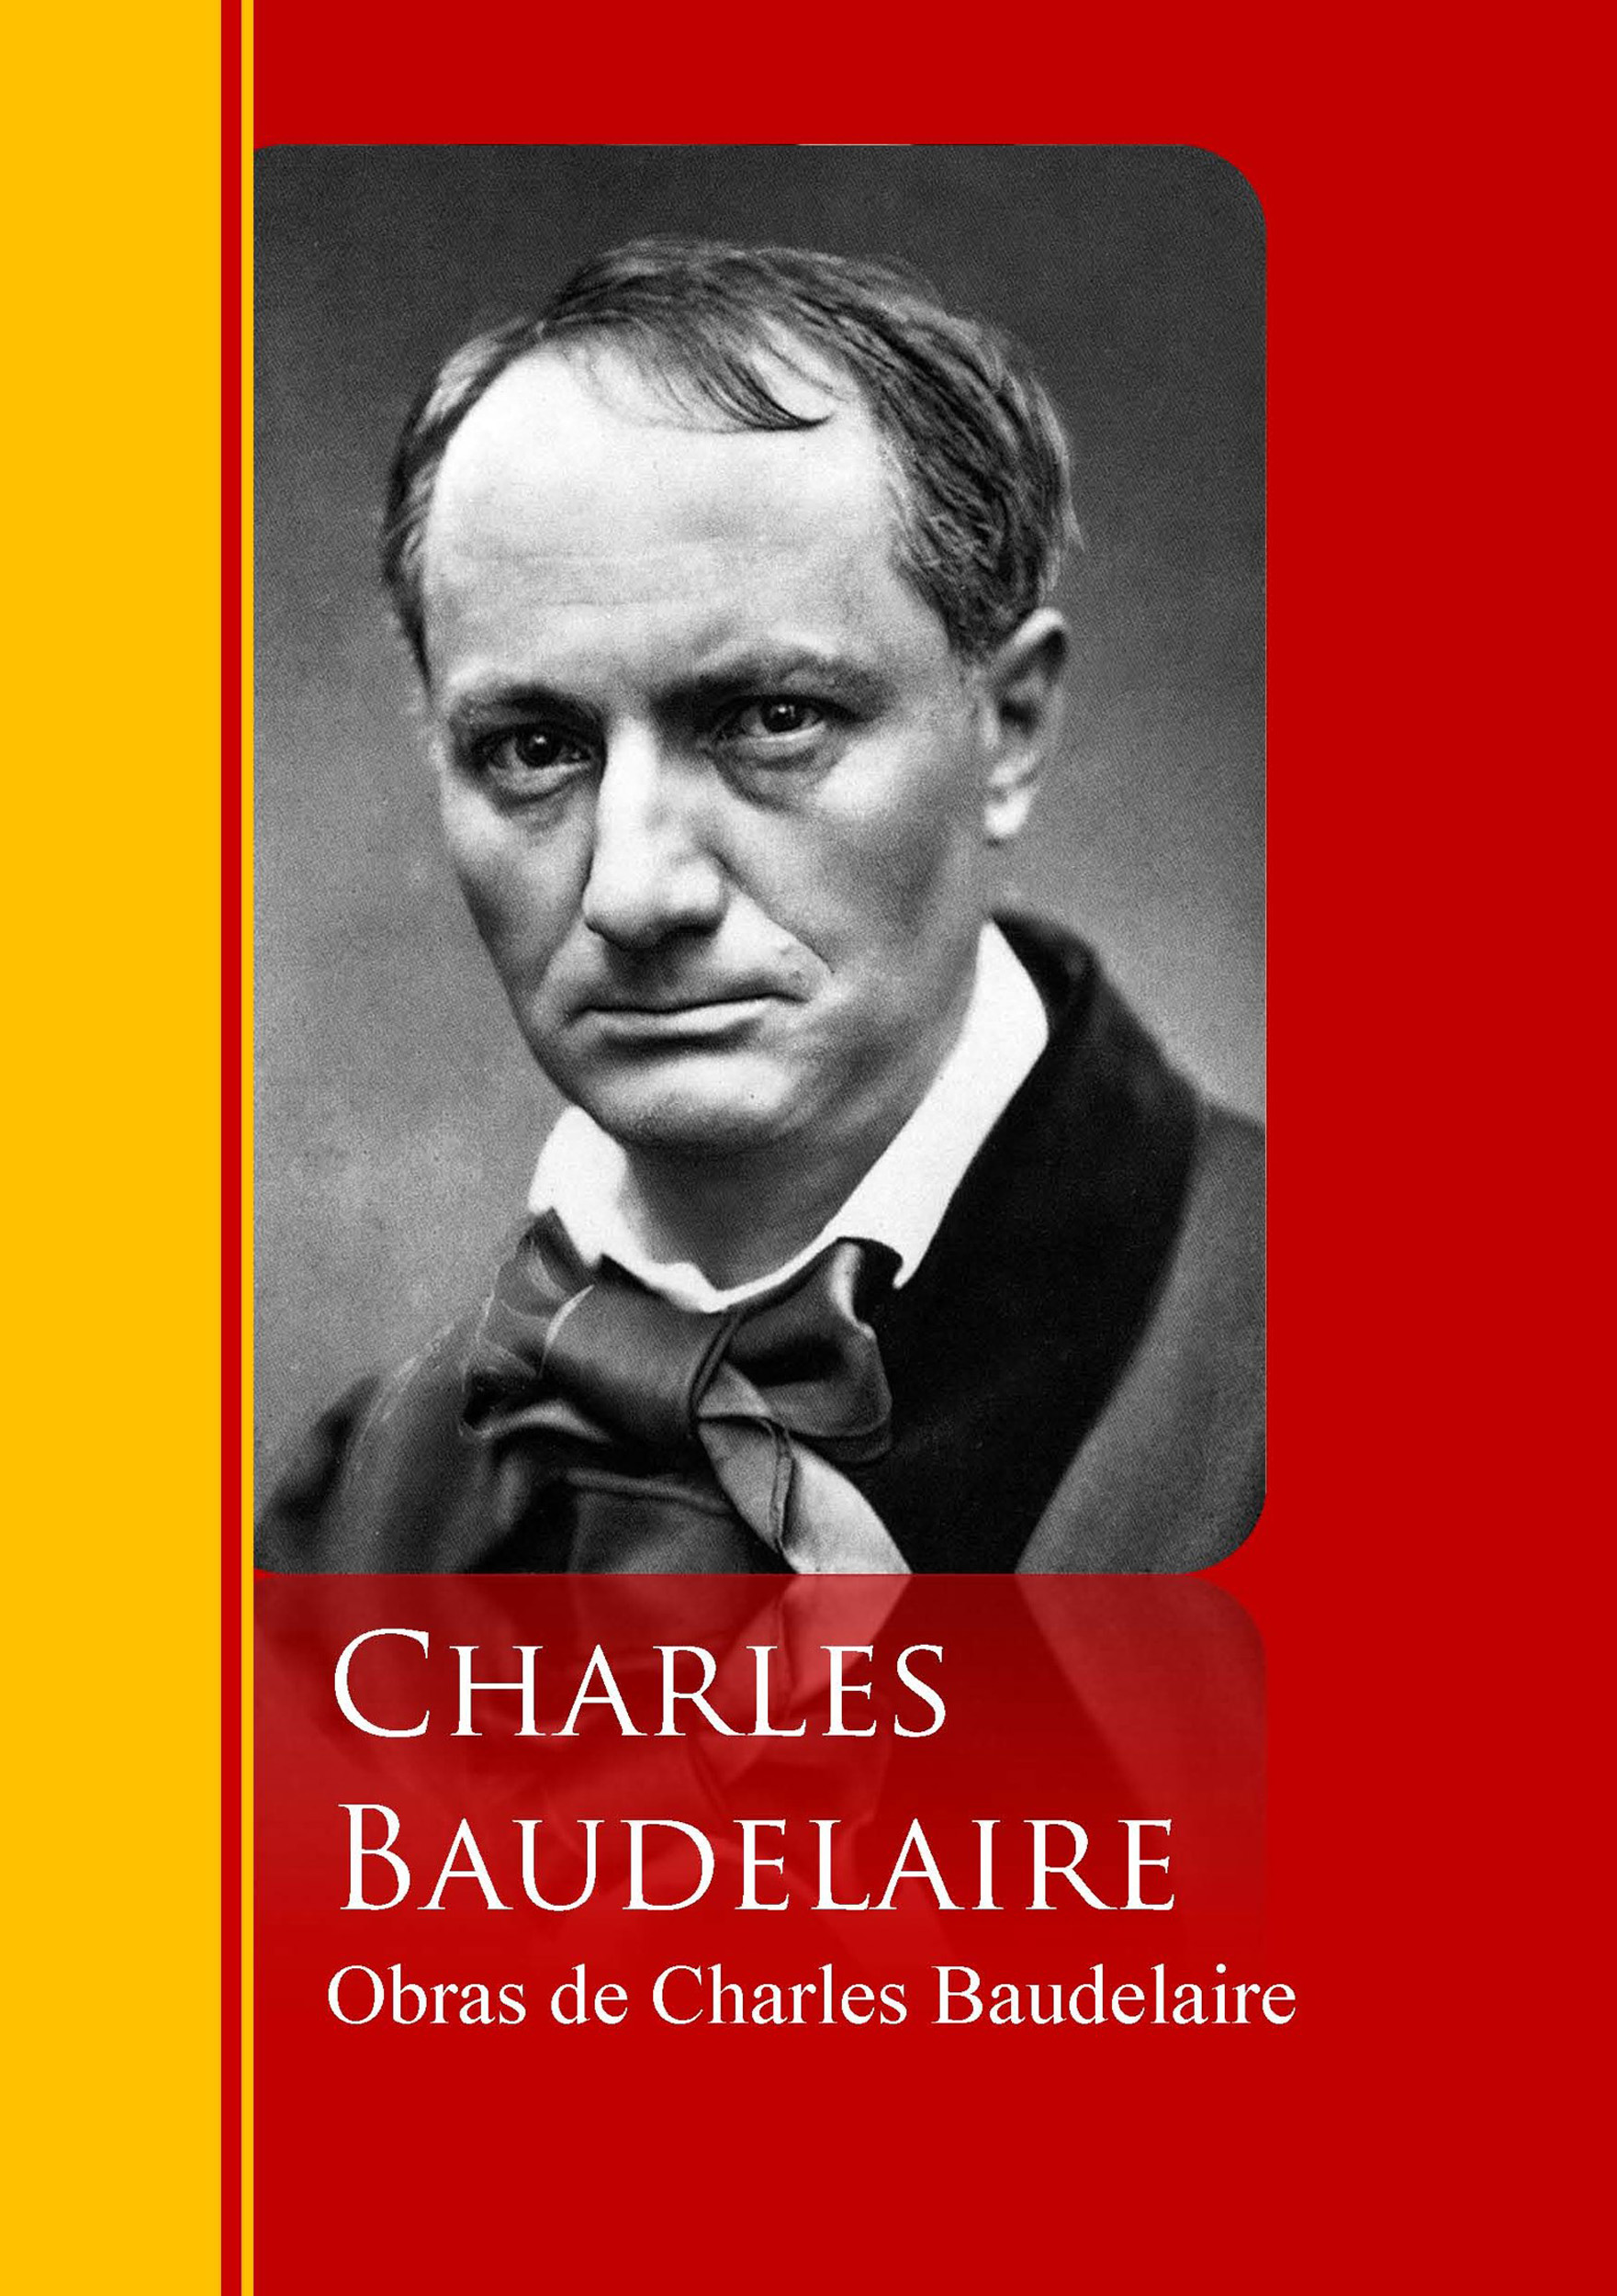 Baudelaire Charles Obras de Charles Baudelaire baudelaire charles albatros